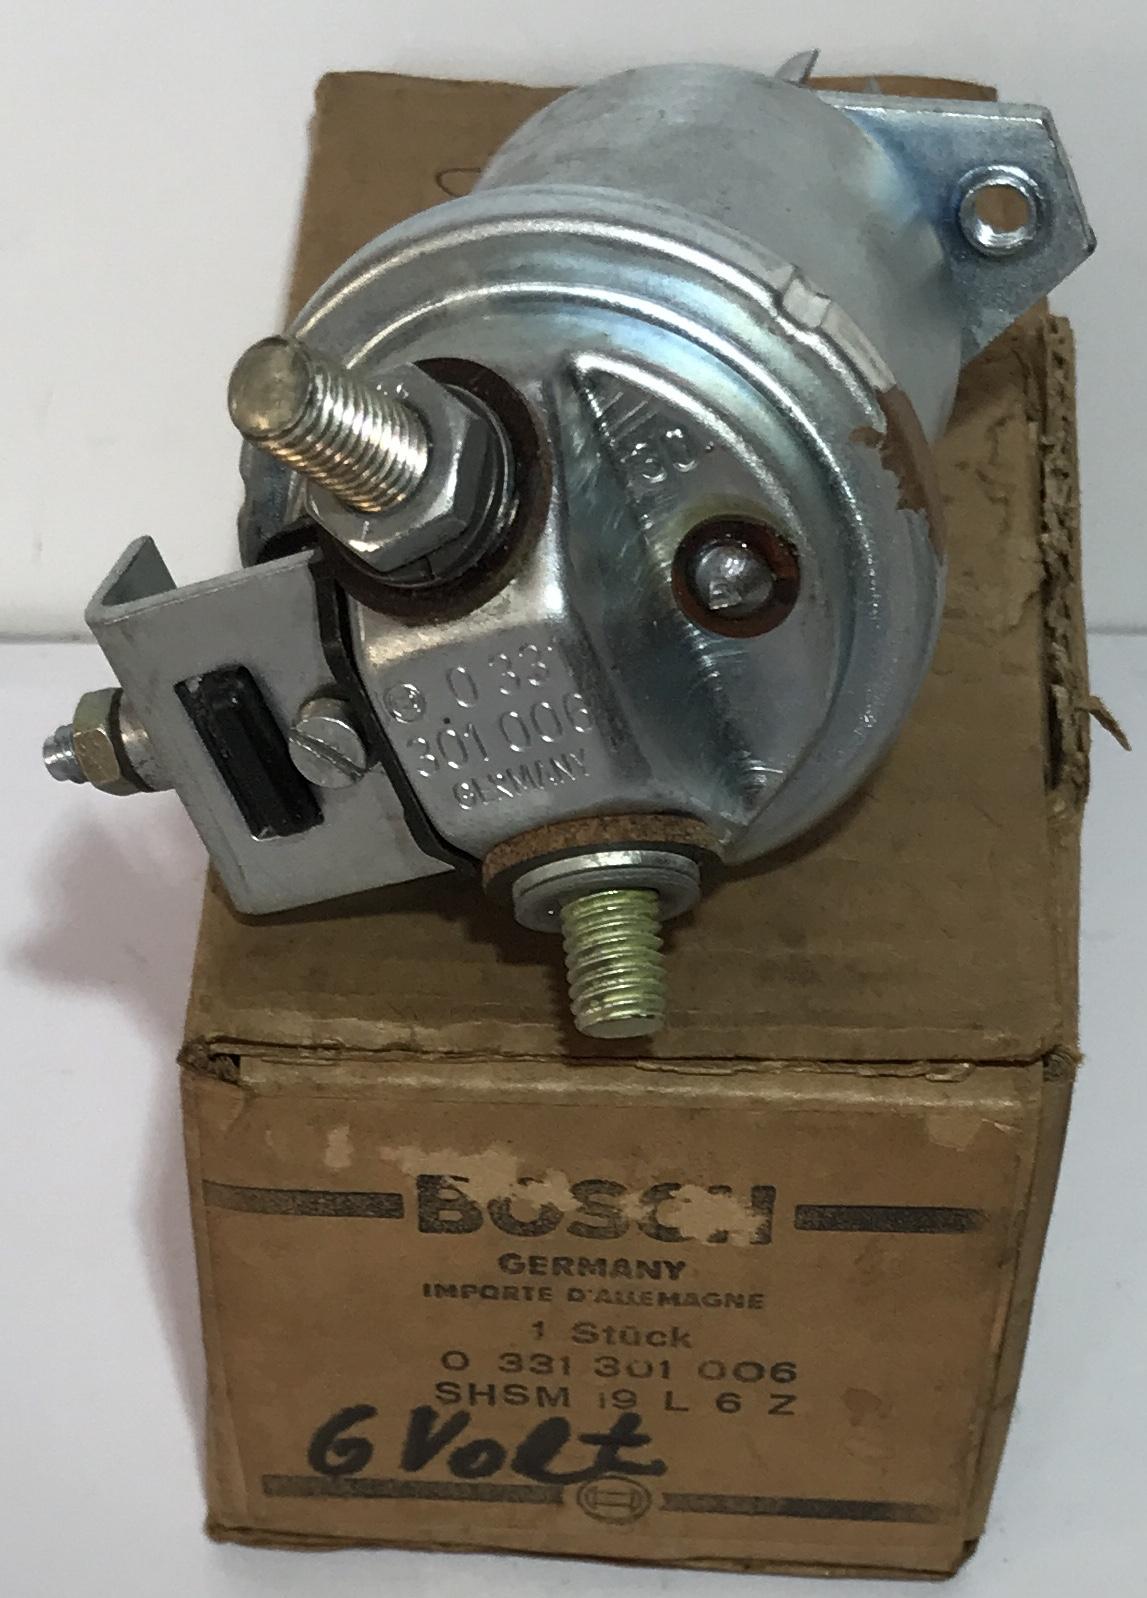 Bosch Magnetschalter 0331301006 6Vmagnetic switch commutateur magnétique